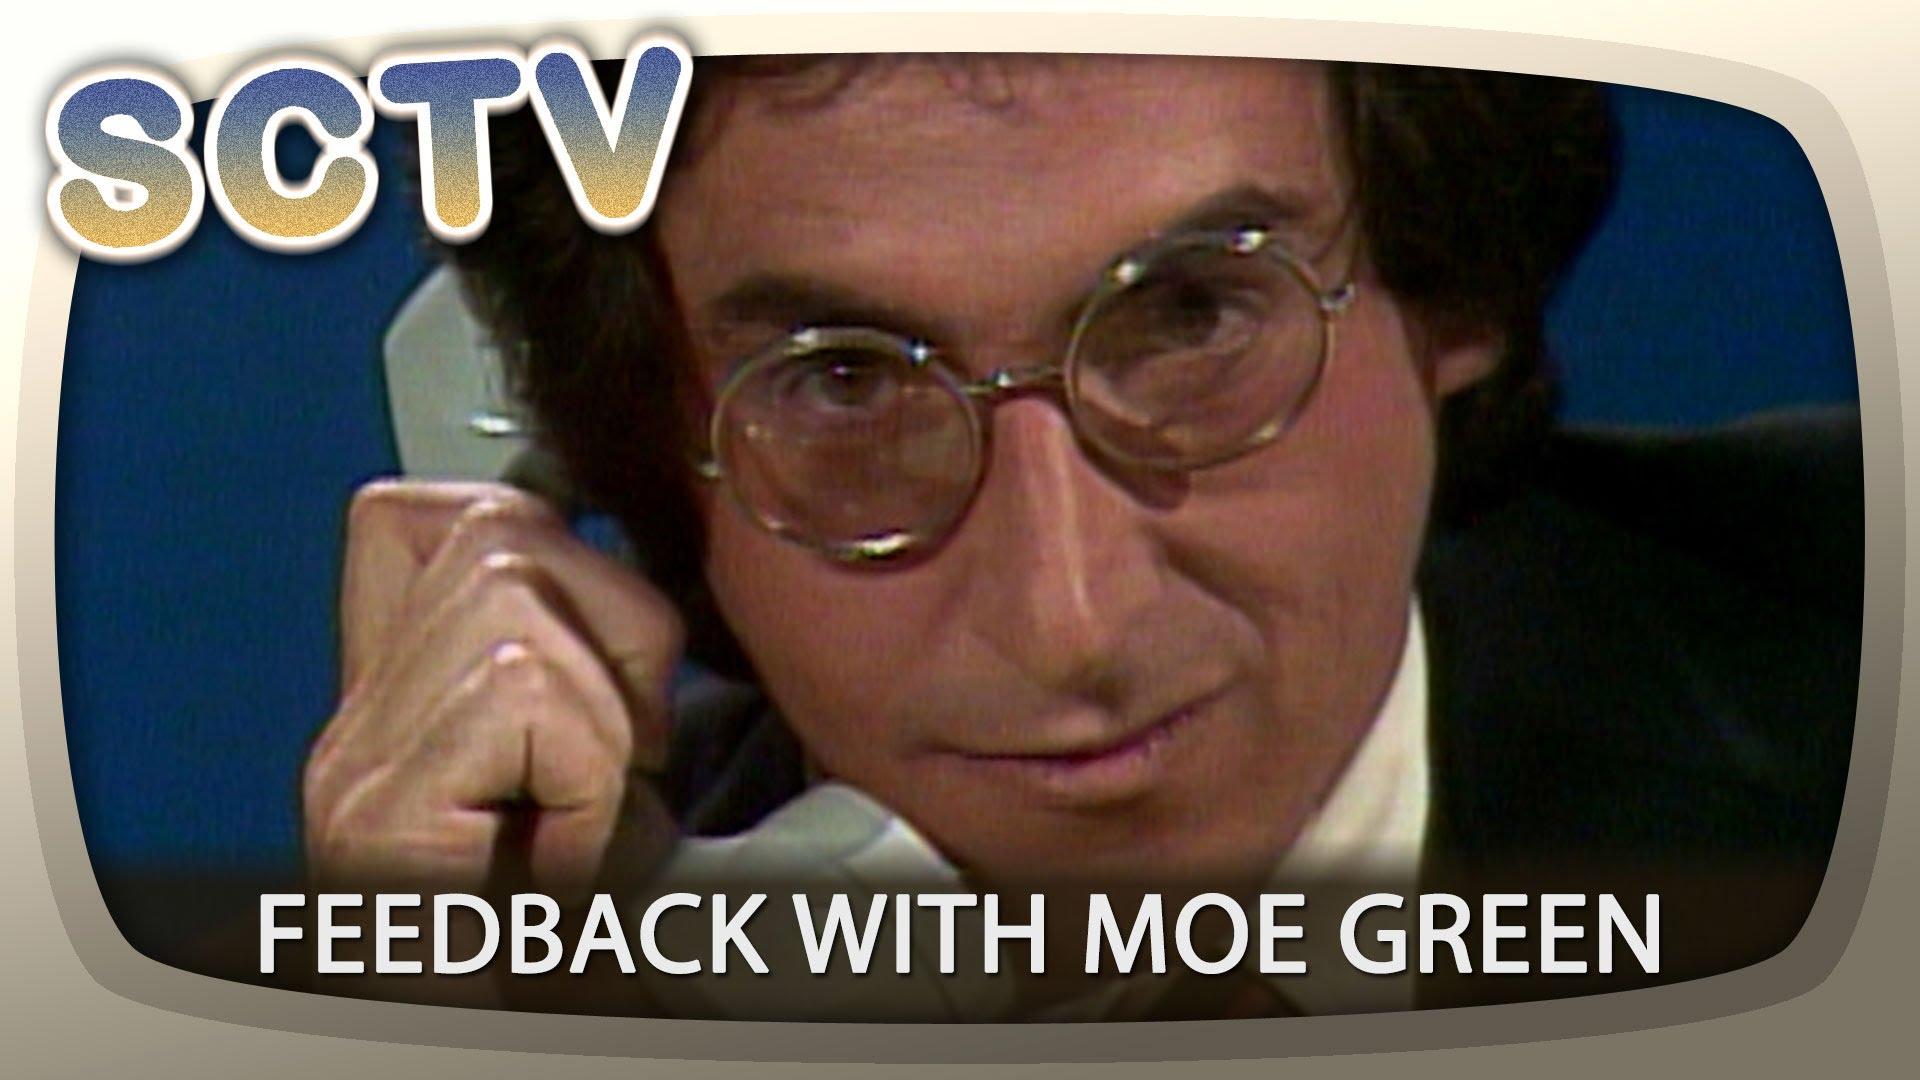 SCTV: Feedback with Moe Green featuring Harold Ramis